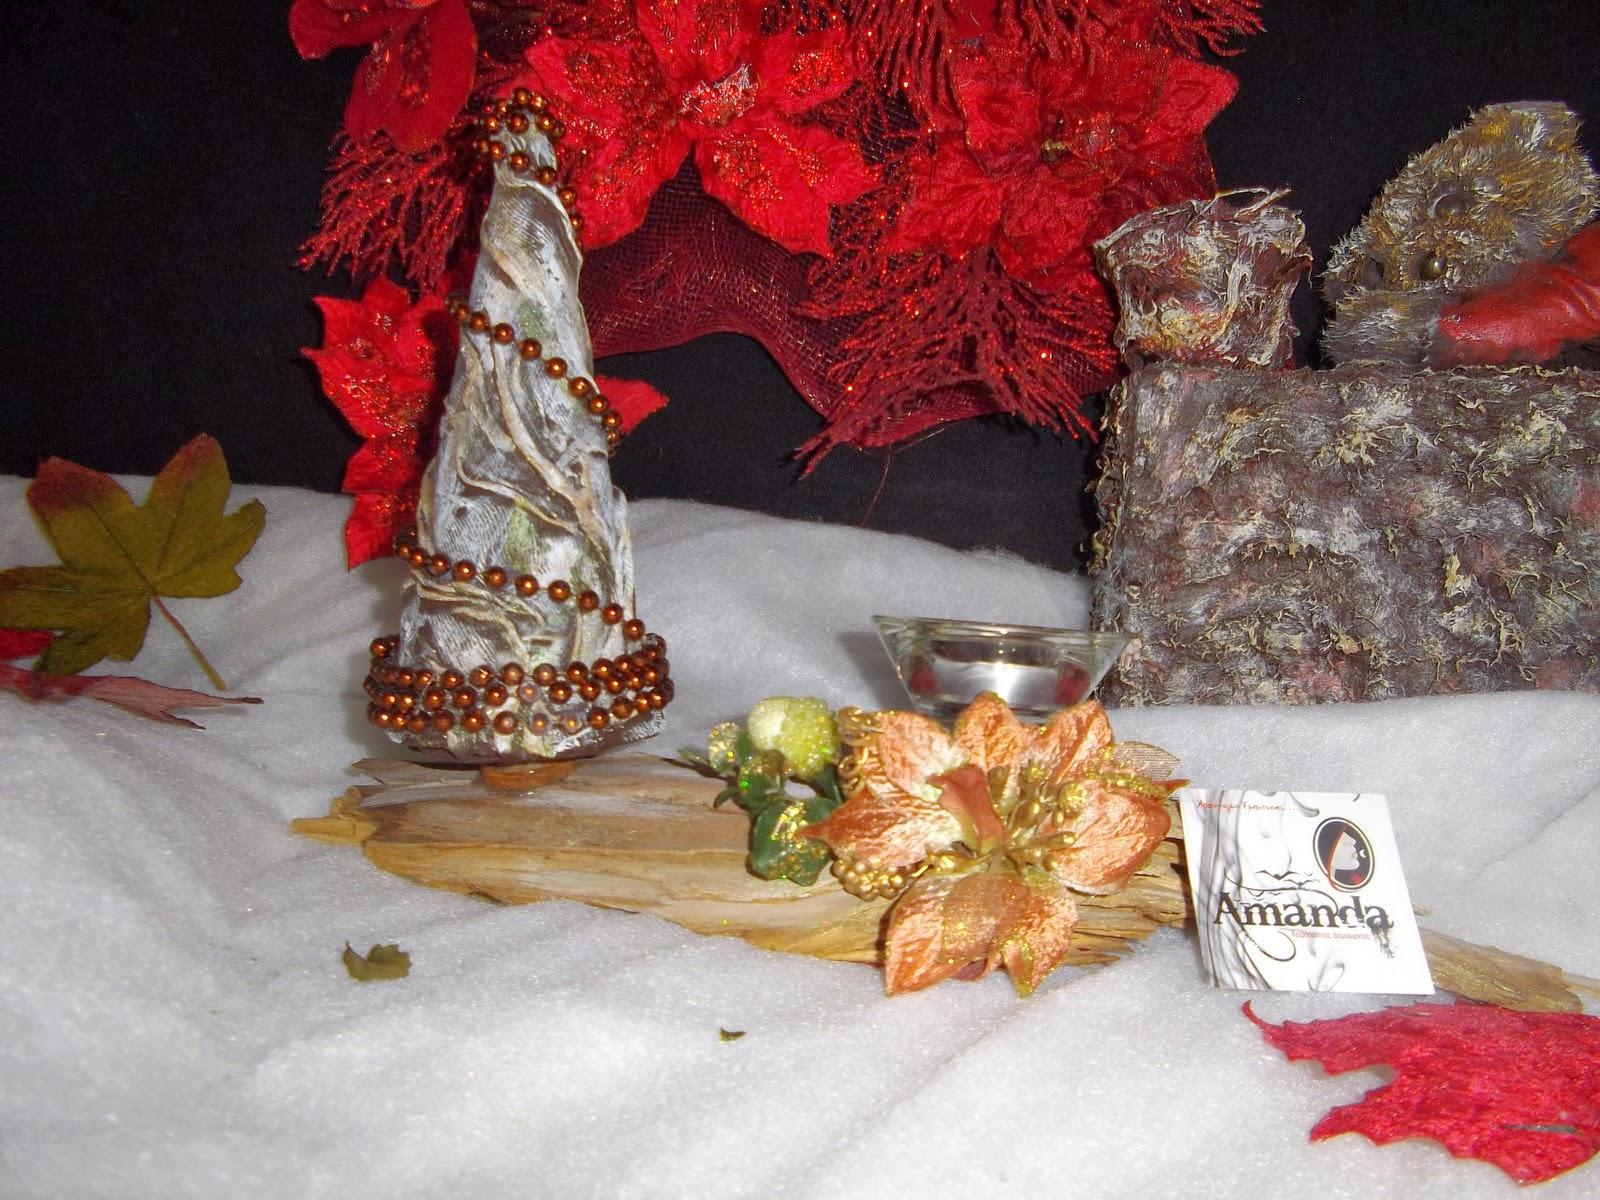 207434d3b16 Amanda's Handmade Creations: Επιτραπέζια χριστουγεννιάτικη σύνθεση ...